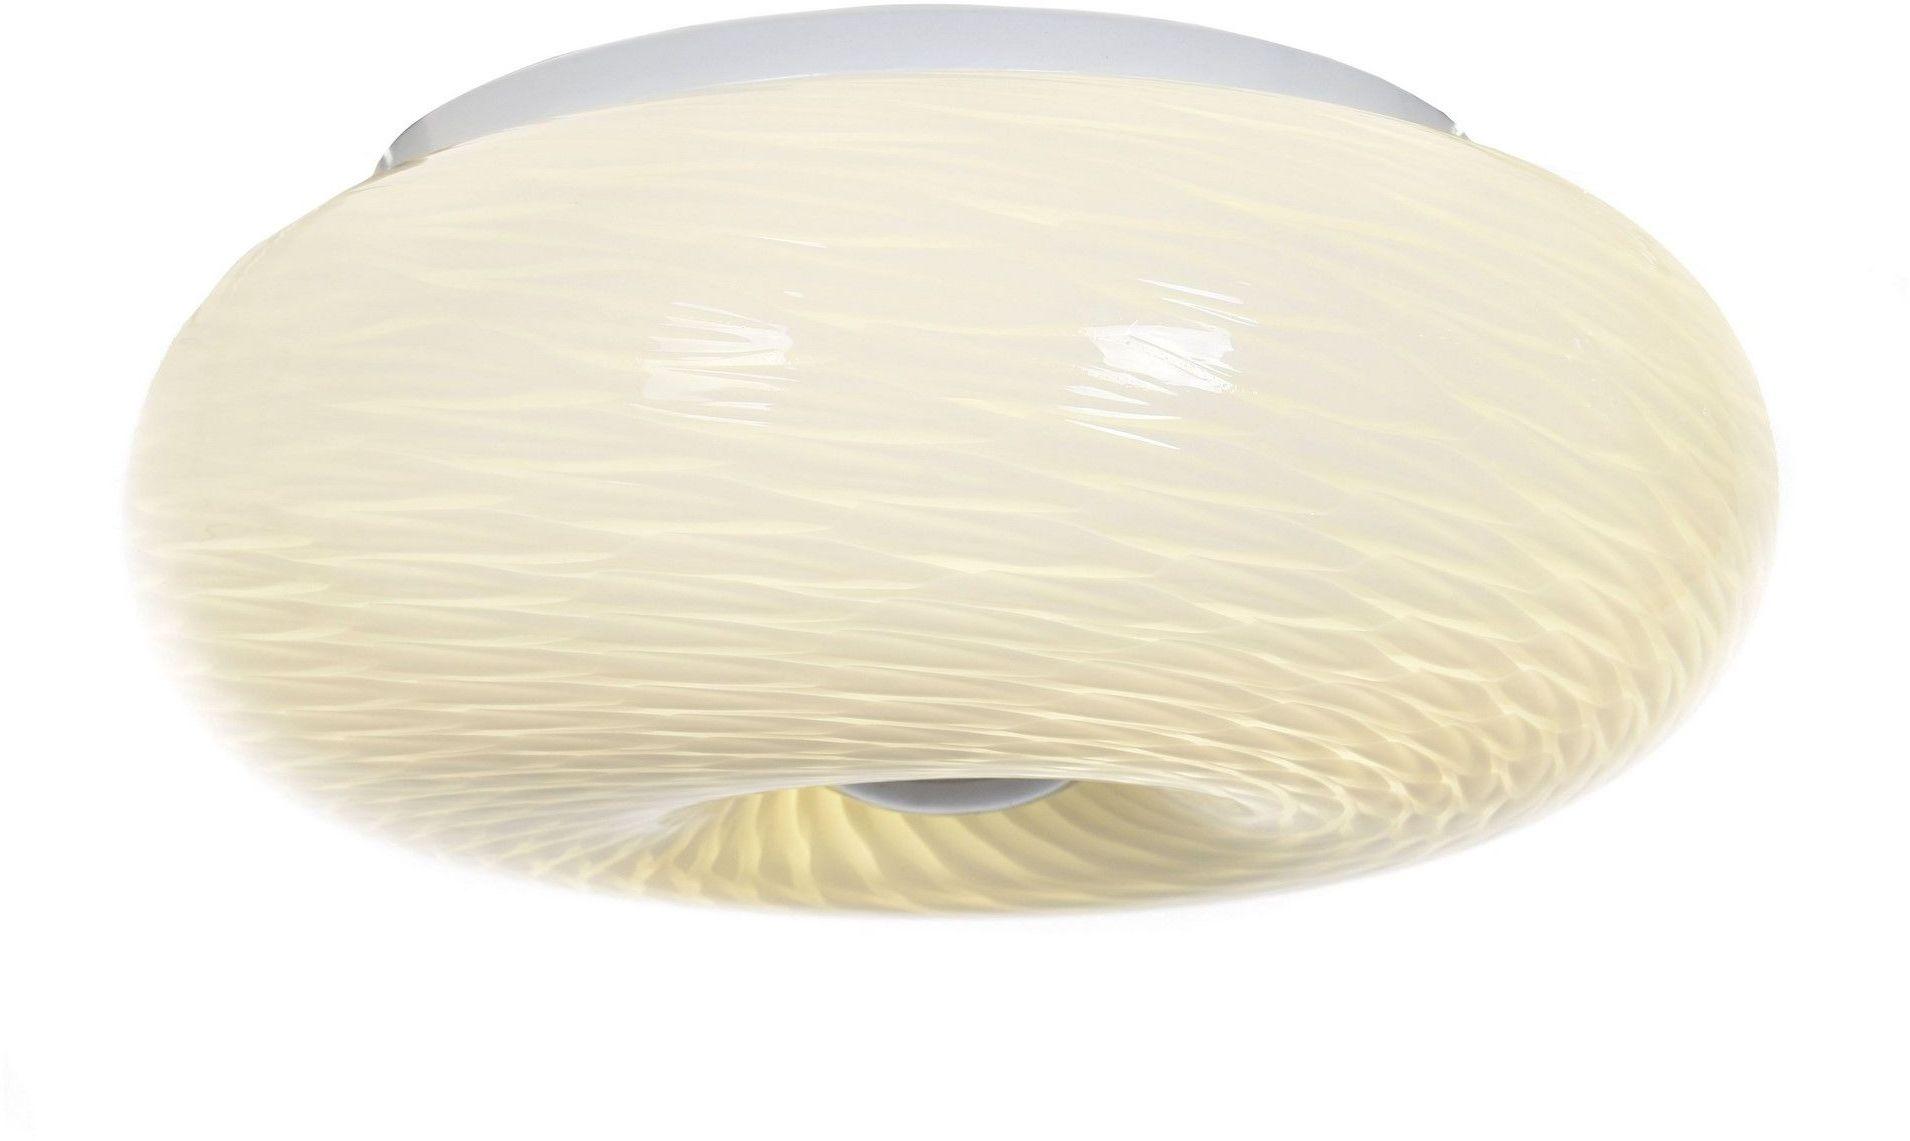 NOWOCZESNA LAMPA SUFITOWA PLAFON EVIANTE D28